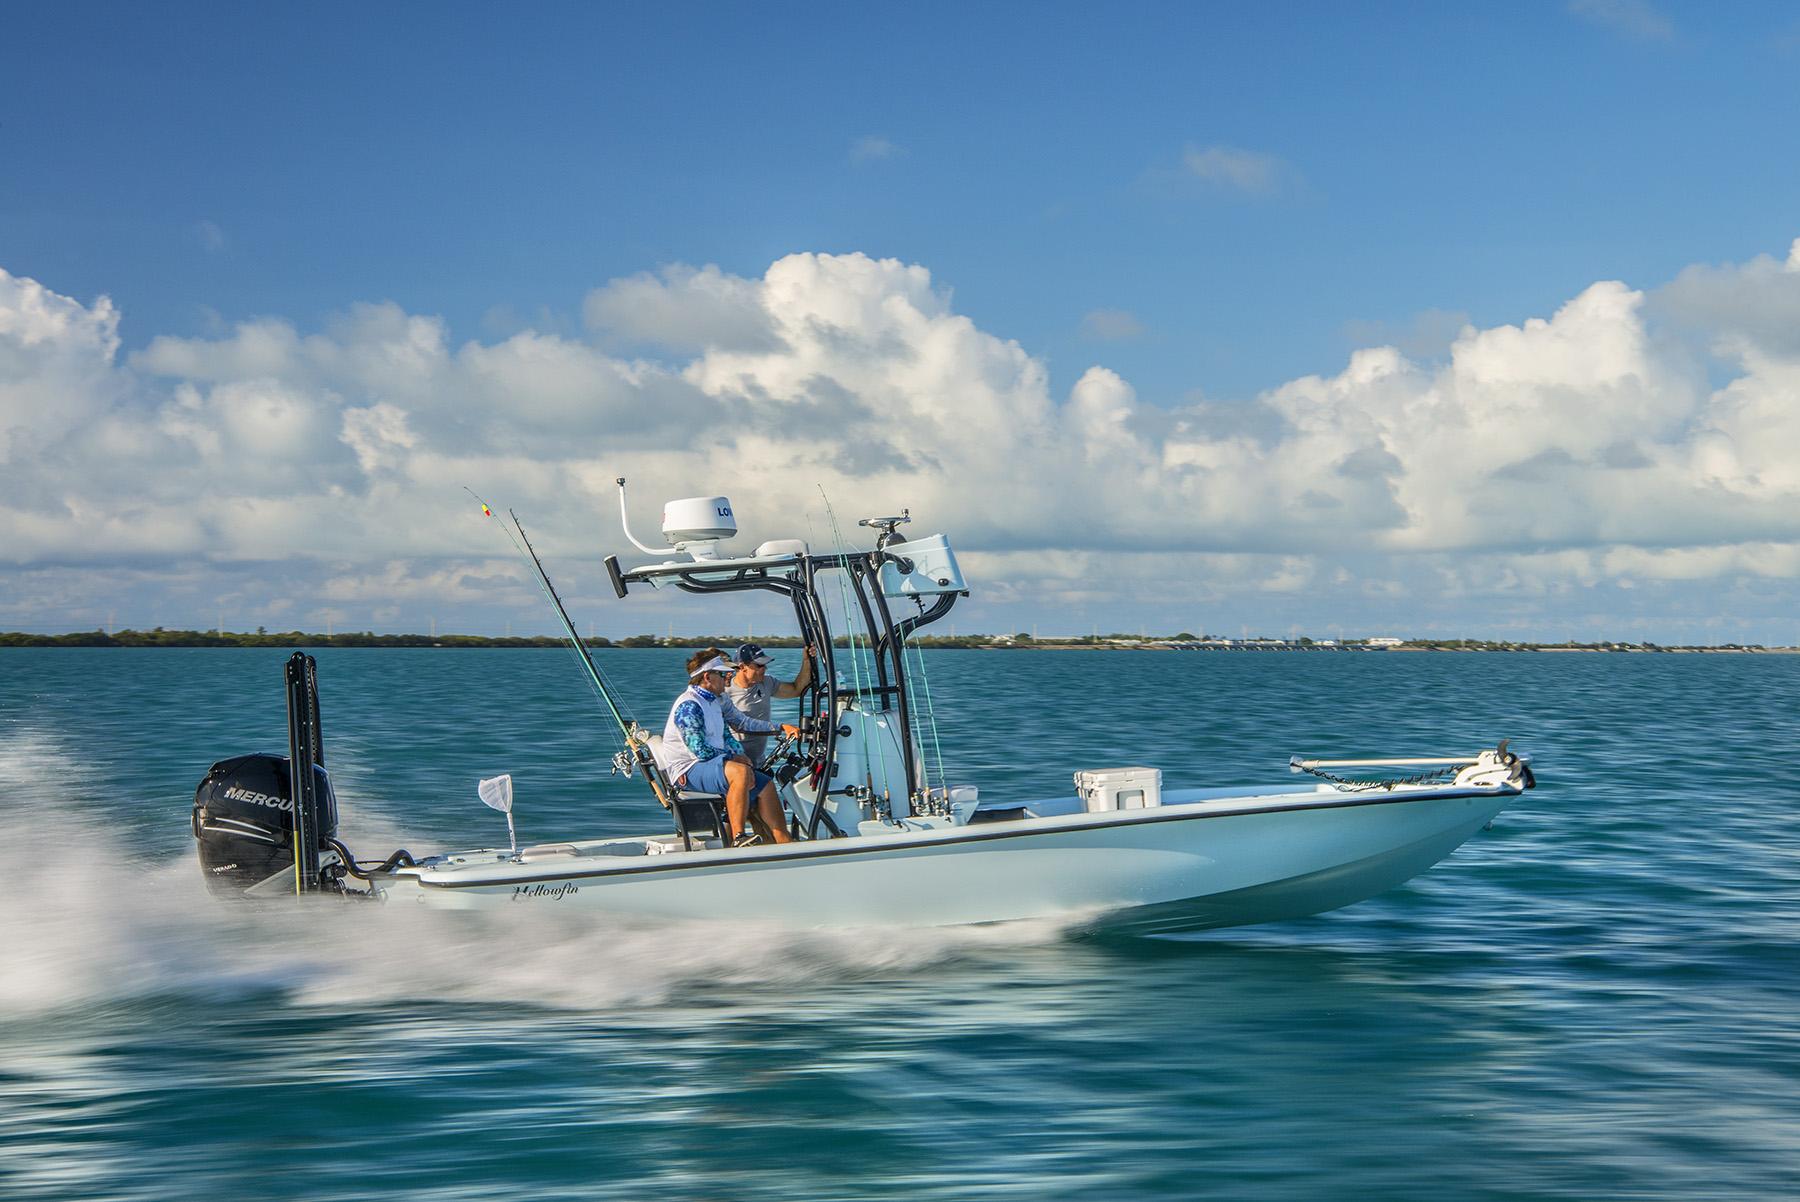 Cruising in our Yellowfin